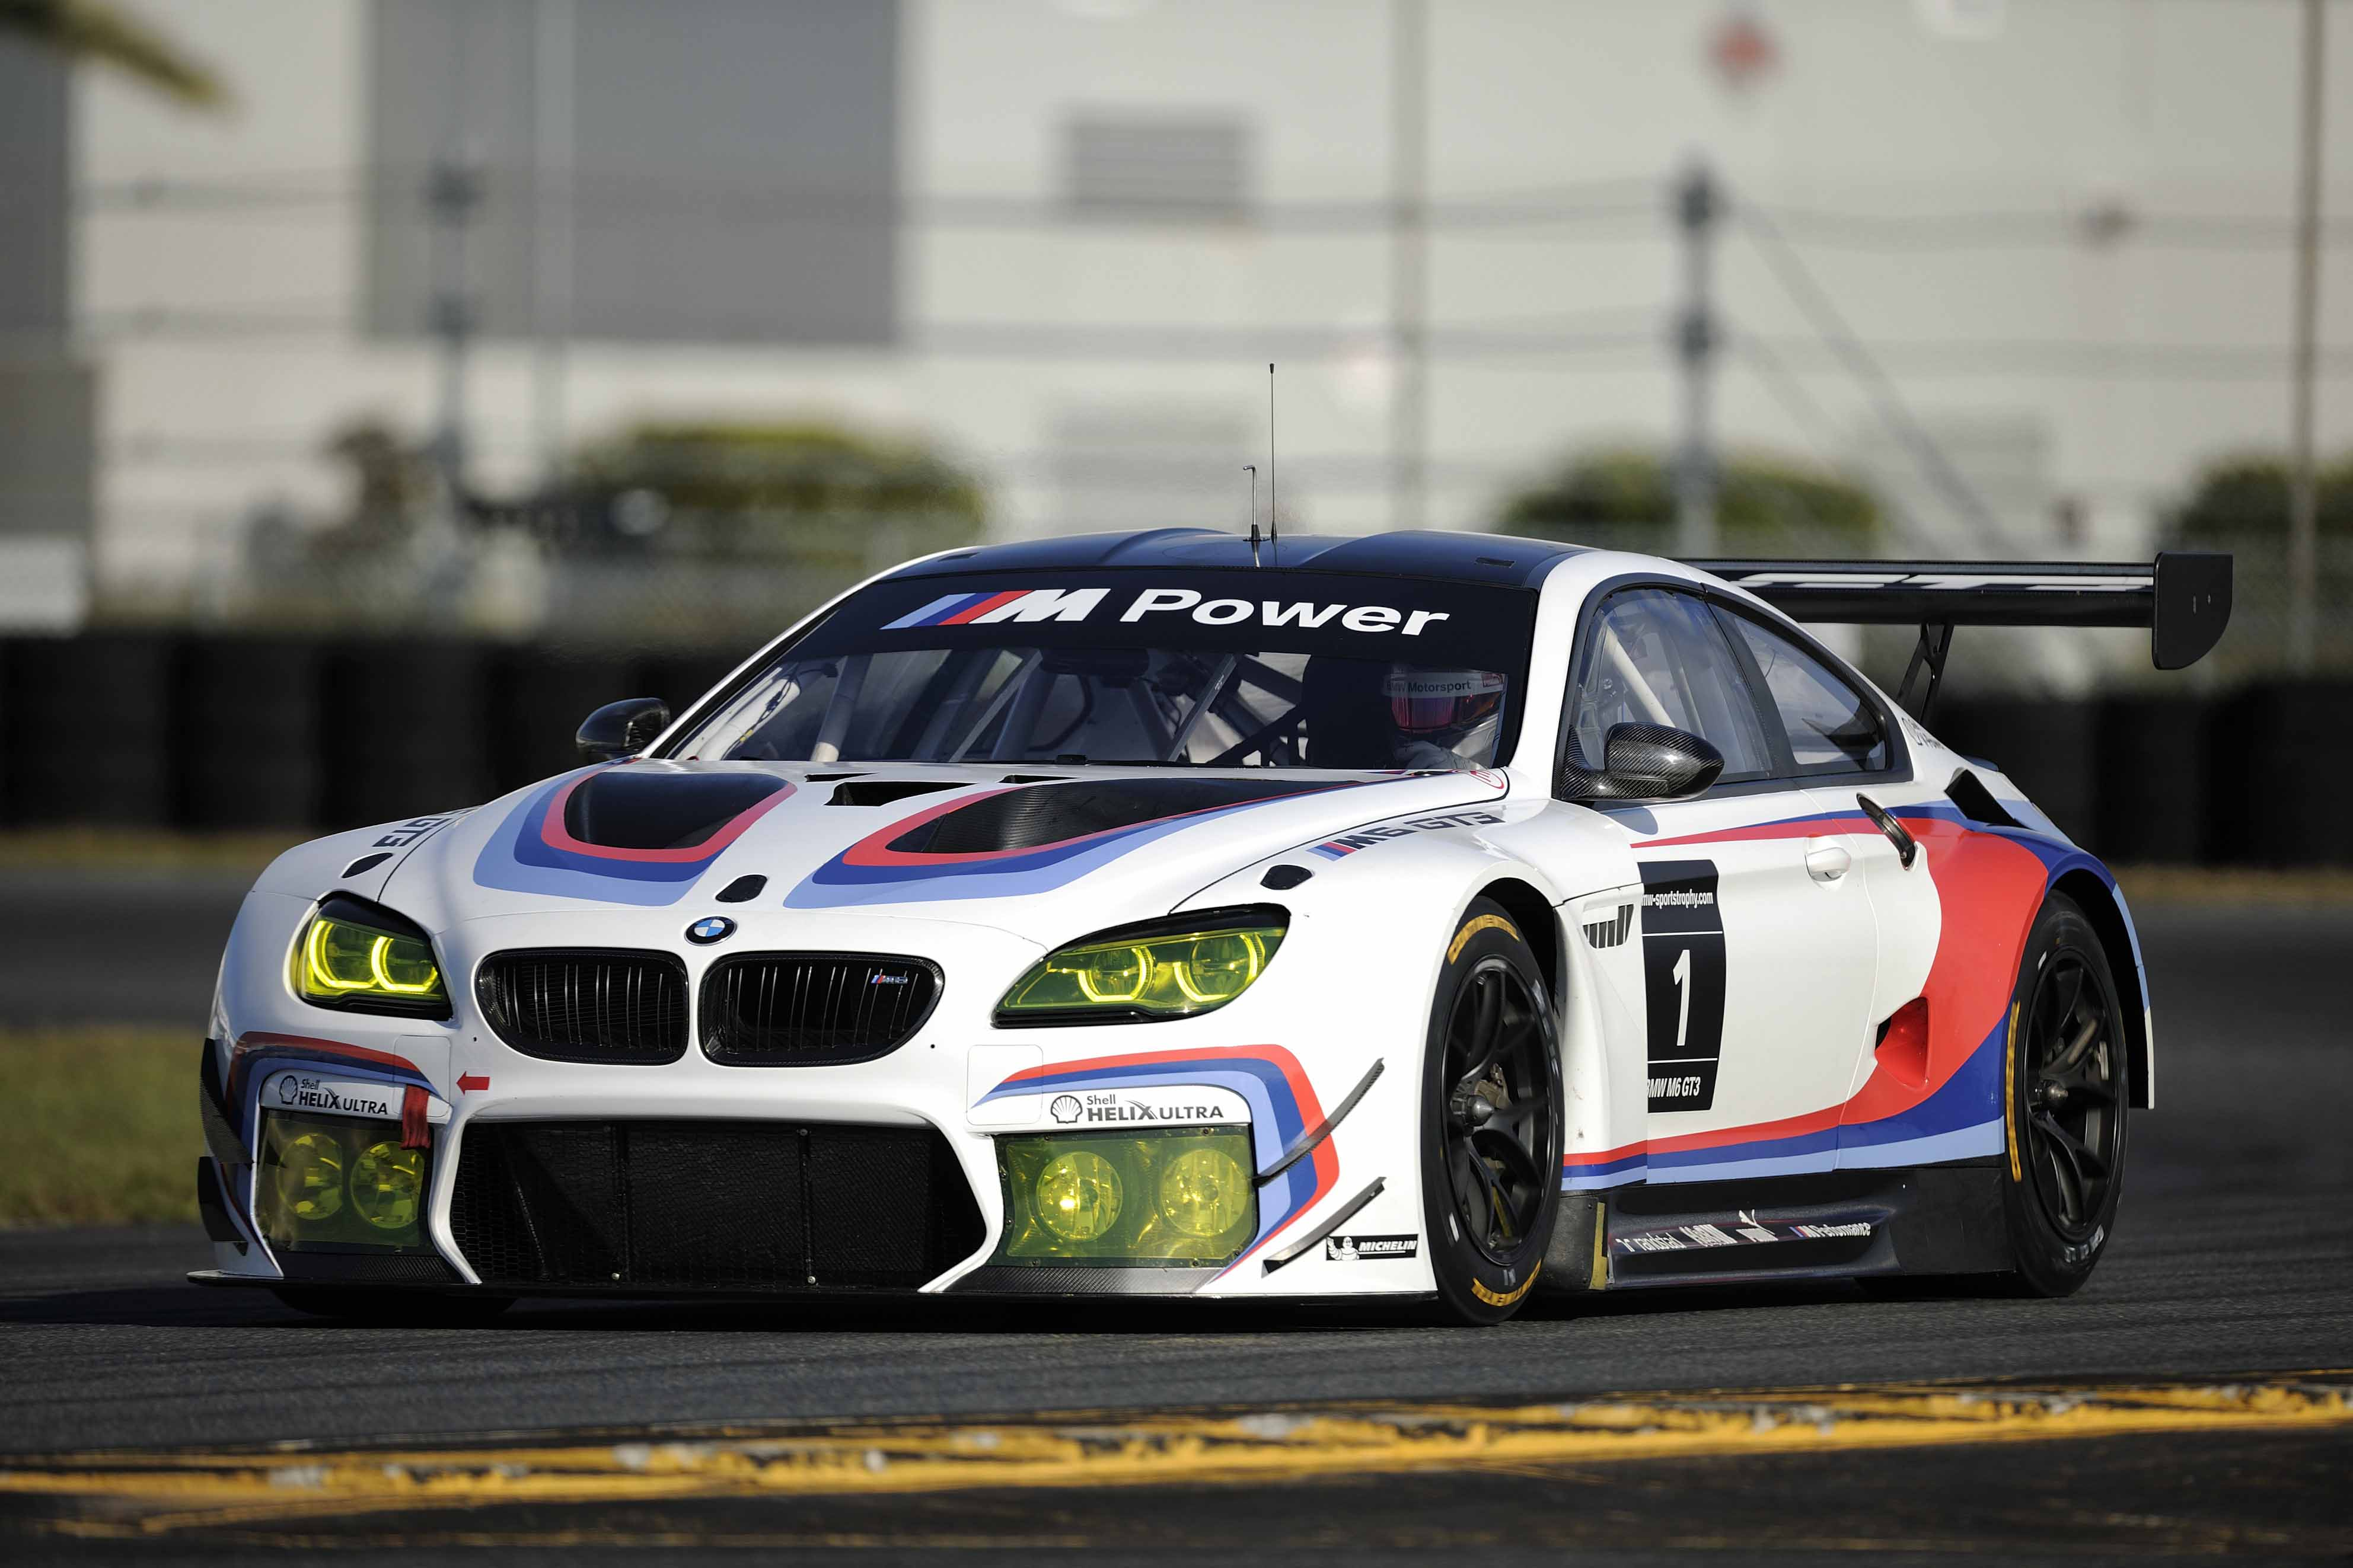 Bmw Motorsport Announces Its 2016 Plans Bmw Car Club Of America